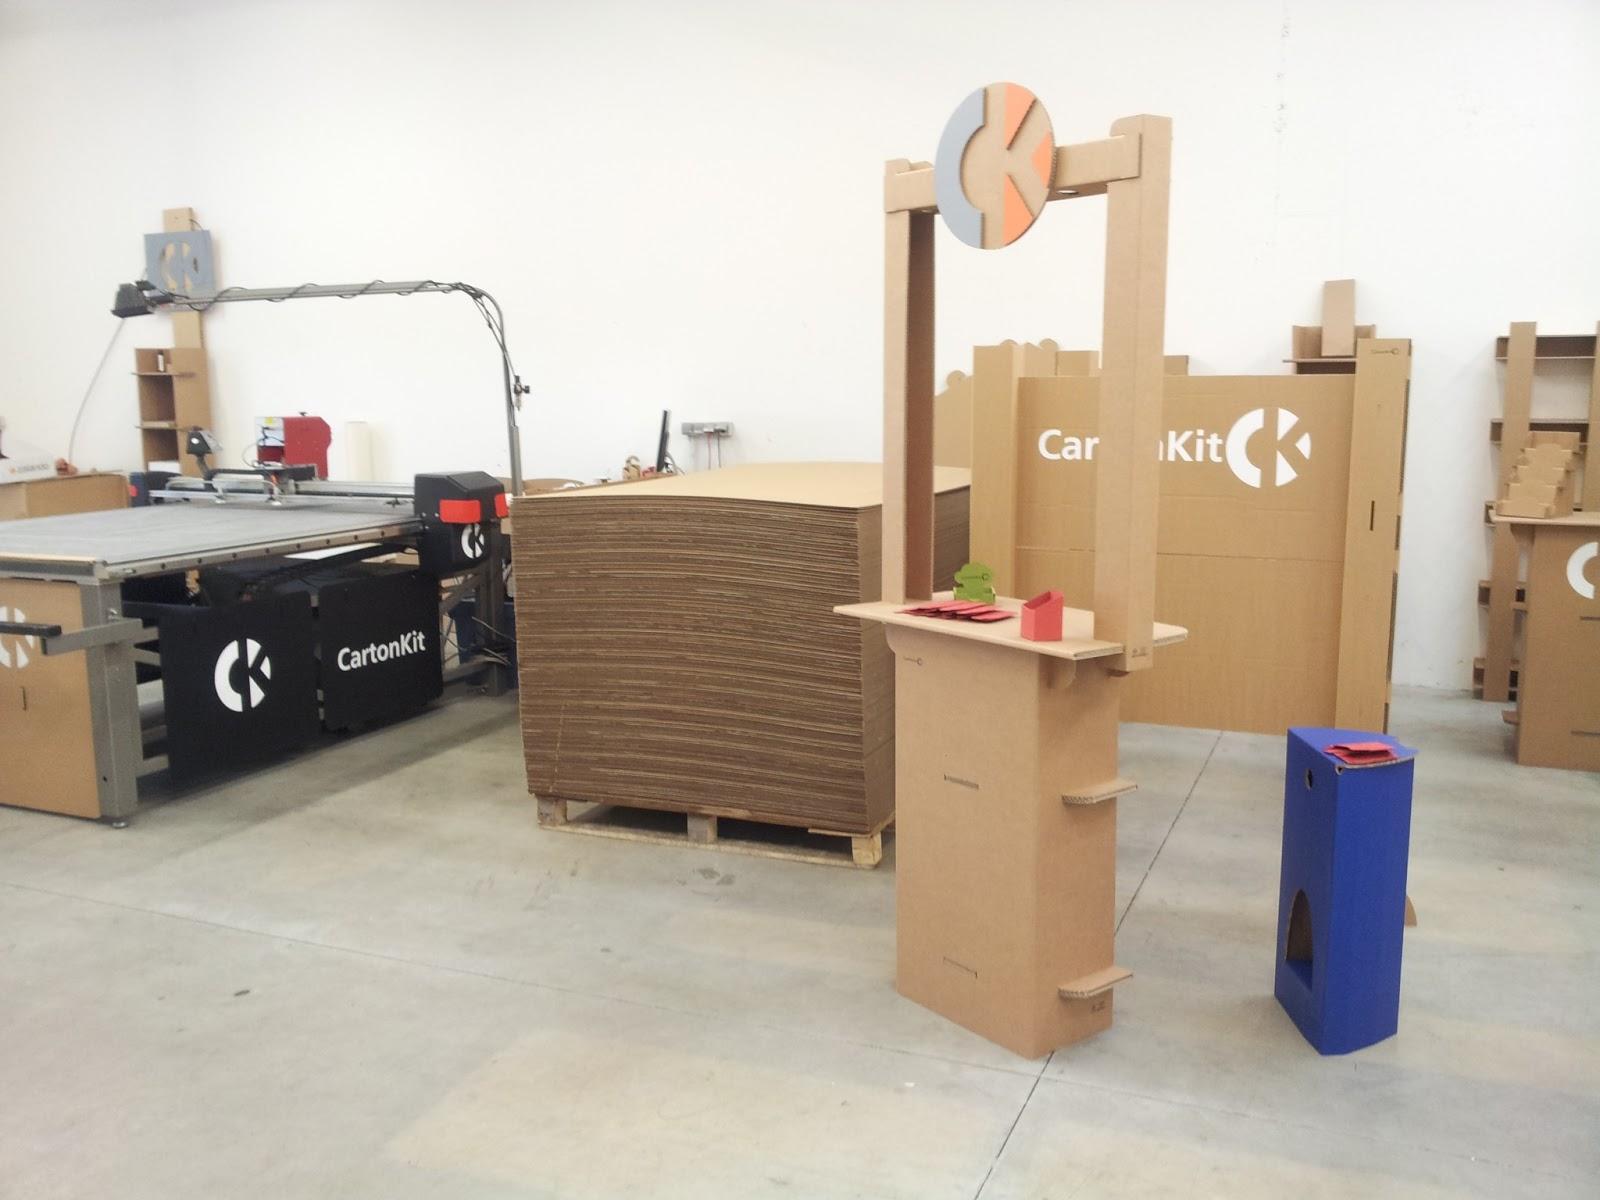 carton kit cr ations objets et meubles 100 carton accueil. Black Bedroom Furniture Sets. Home Design Ideas